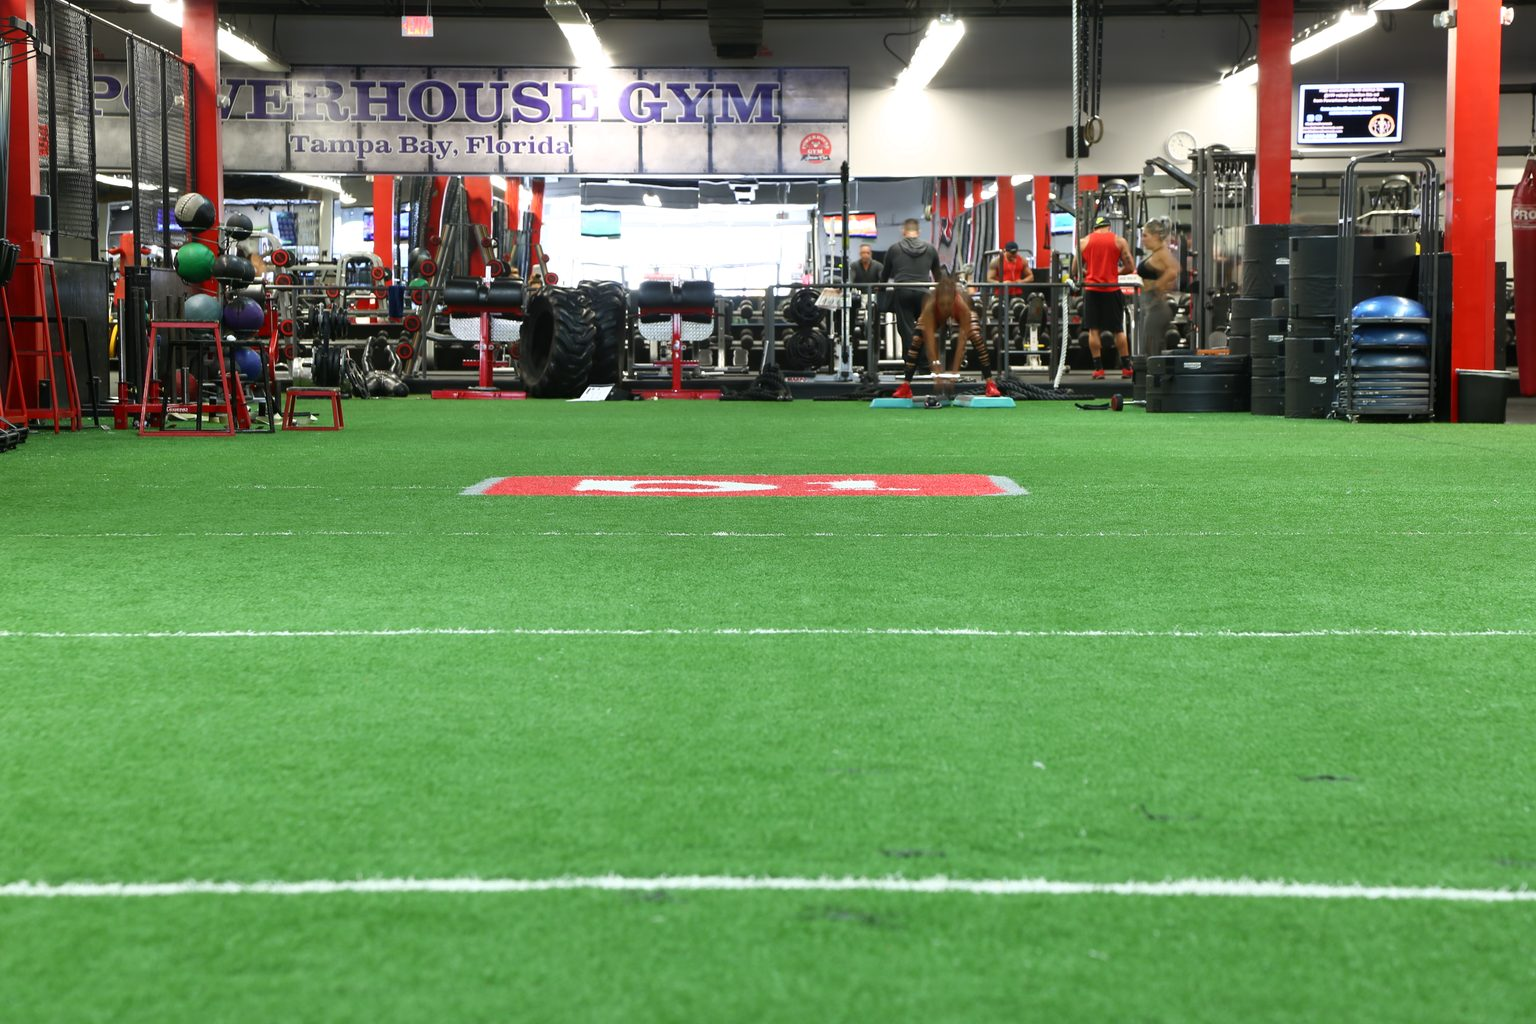 Photo from Powerhouse Gym Athletic Club